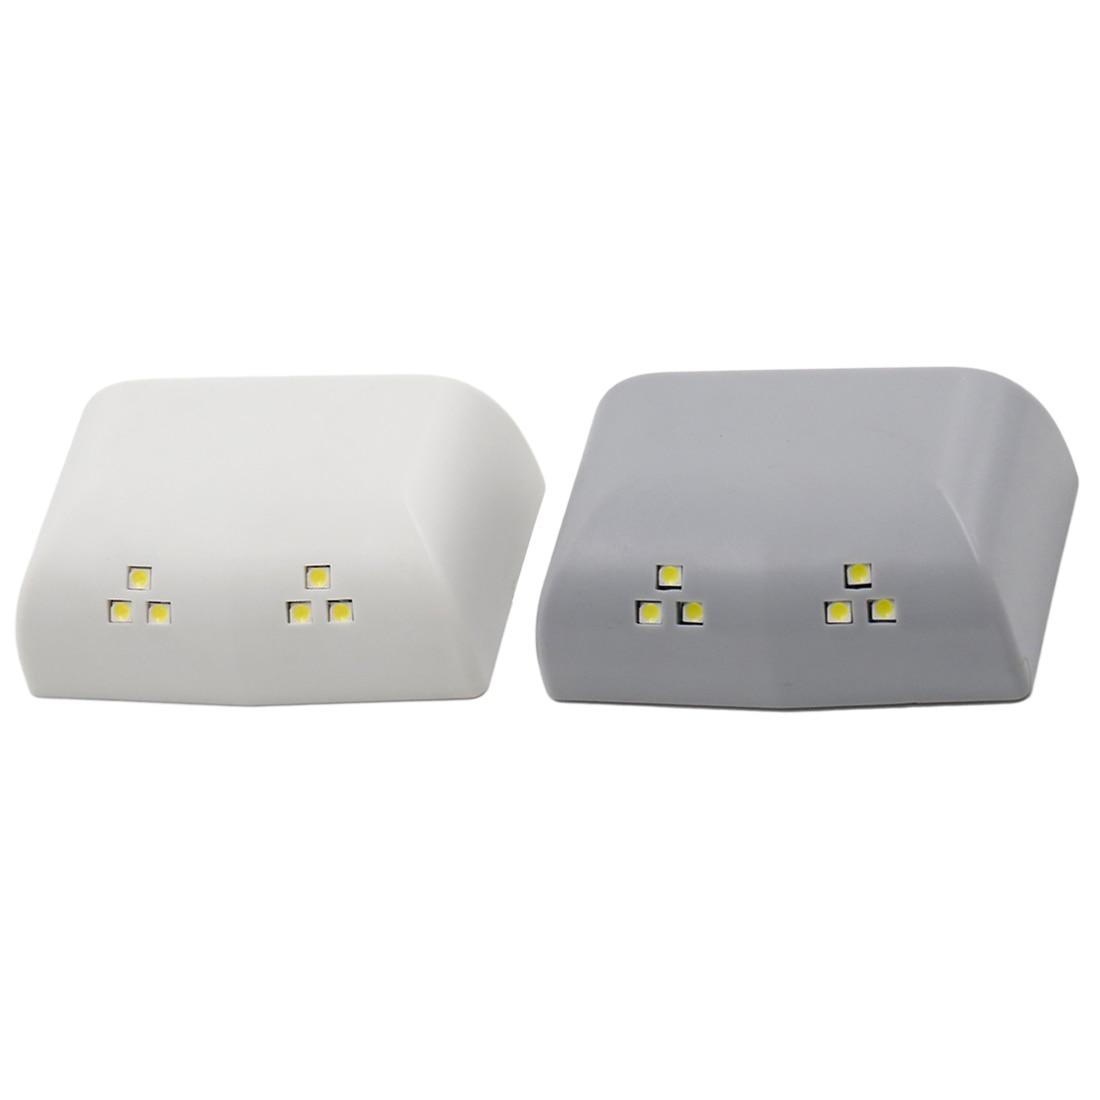 Autoswitch Sensor Night Lights Intelligent Cabinet Wardrobe Cabin Lamp Battery Power LED Light Box Door Home Kitchen Lighting